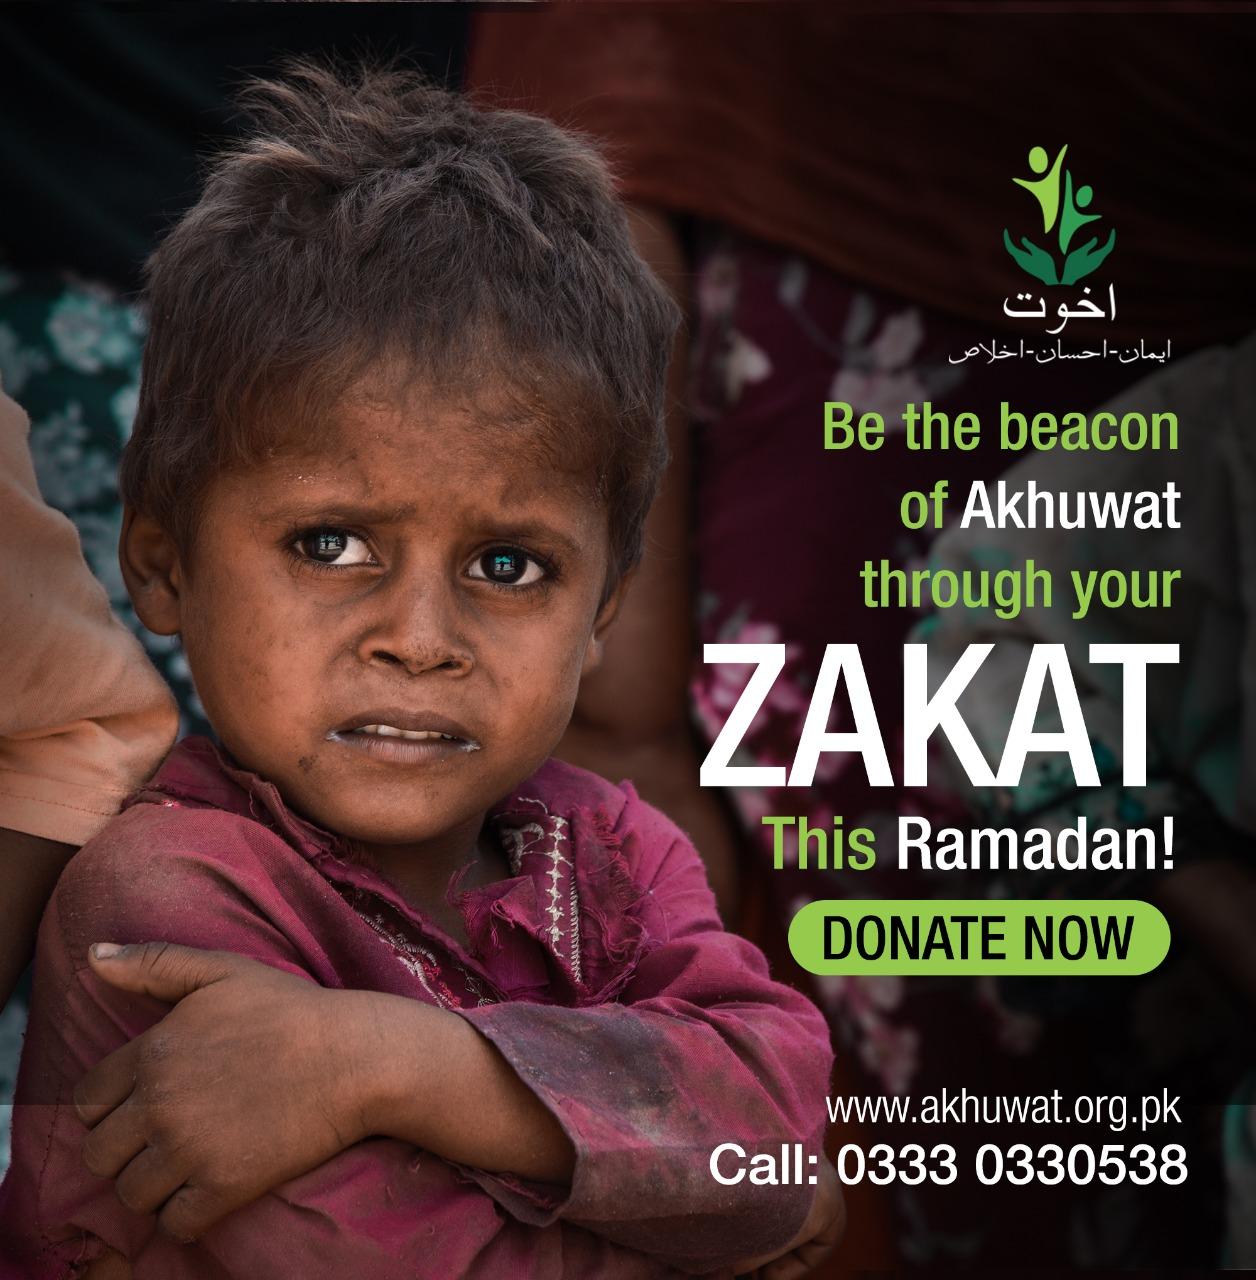 Pay Zakat with Daraz in Ramadan 2021 - Daraz Life